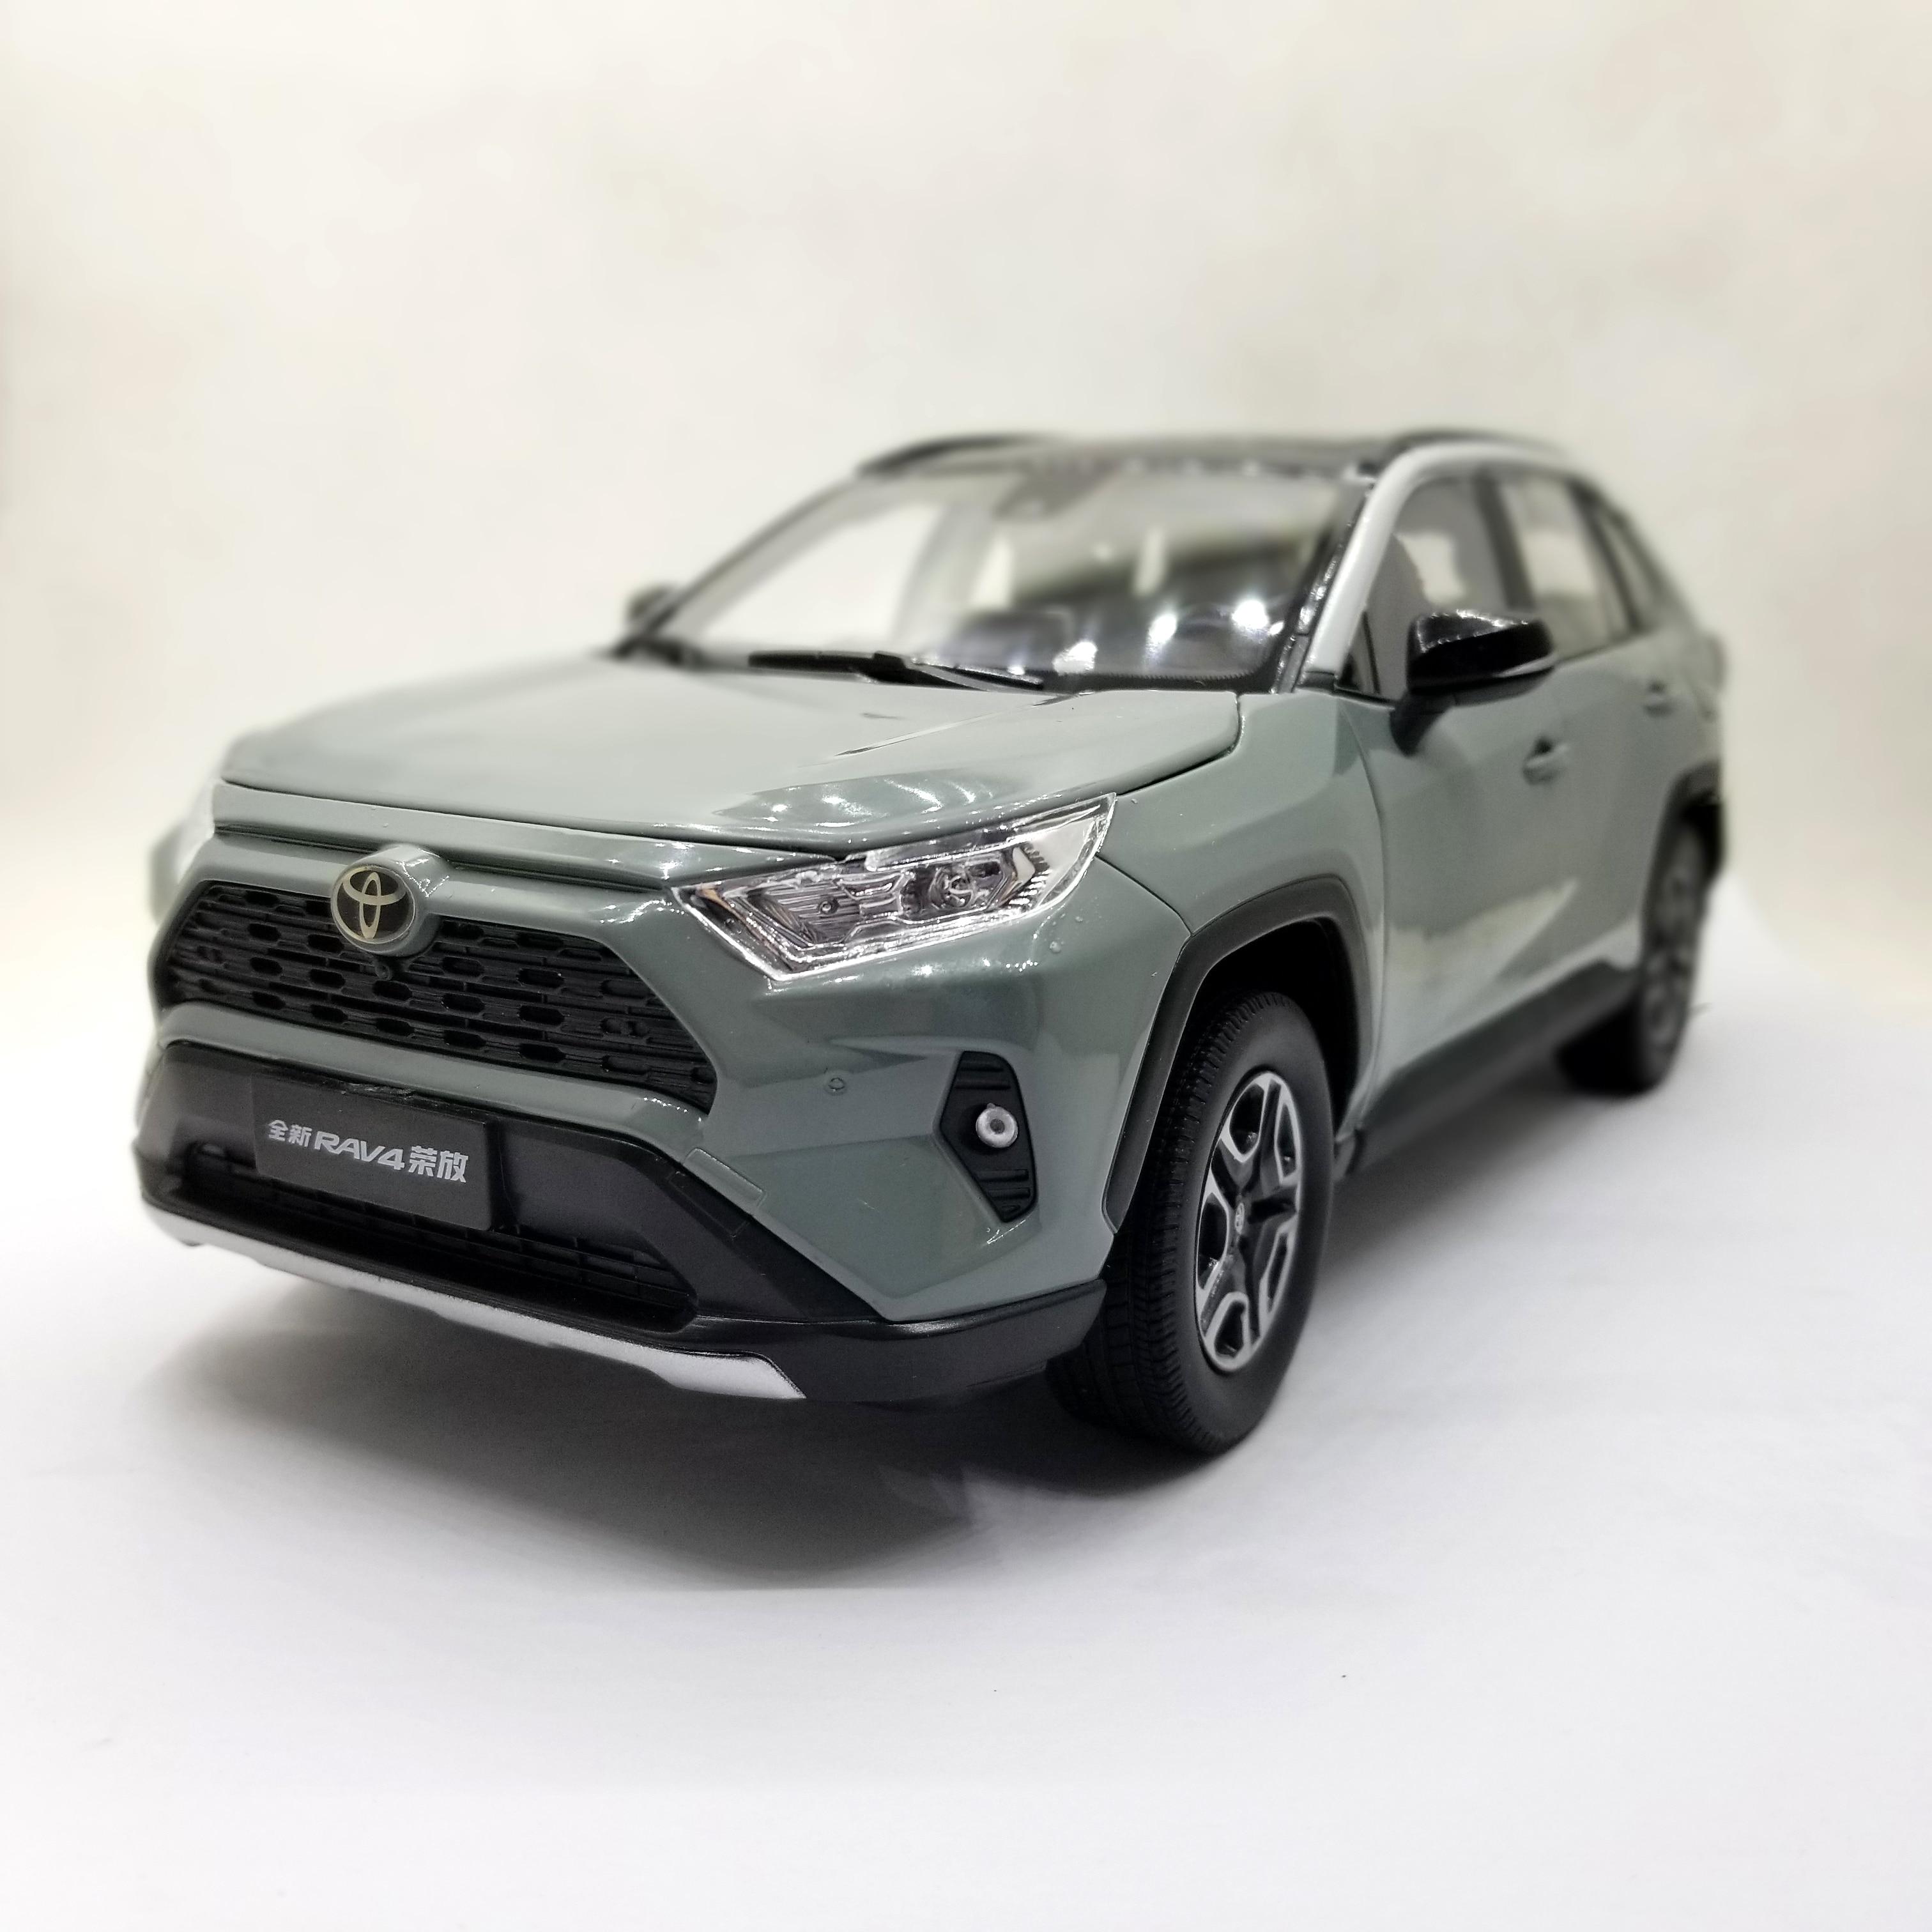 1:18 Diecast Model for Toyota RAV4 2020 Gray SUV Alloy Toy Car...